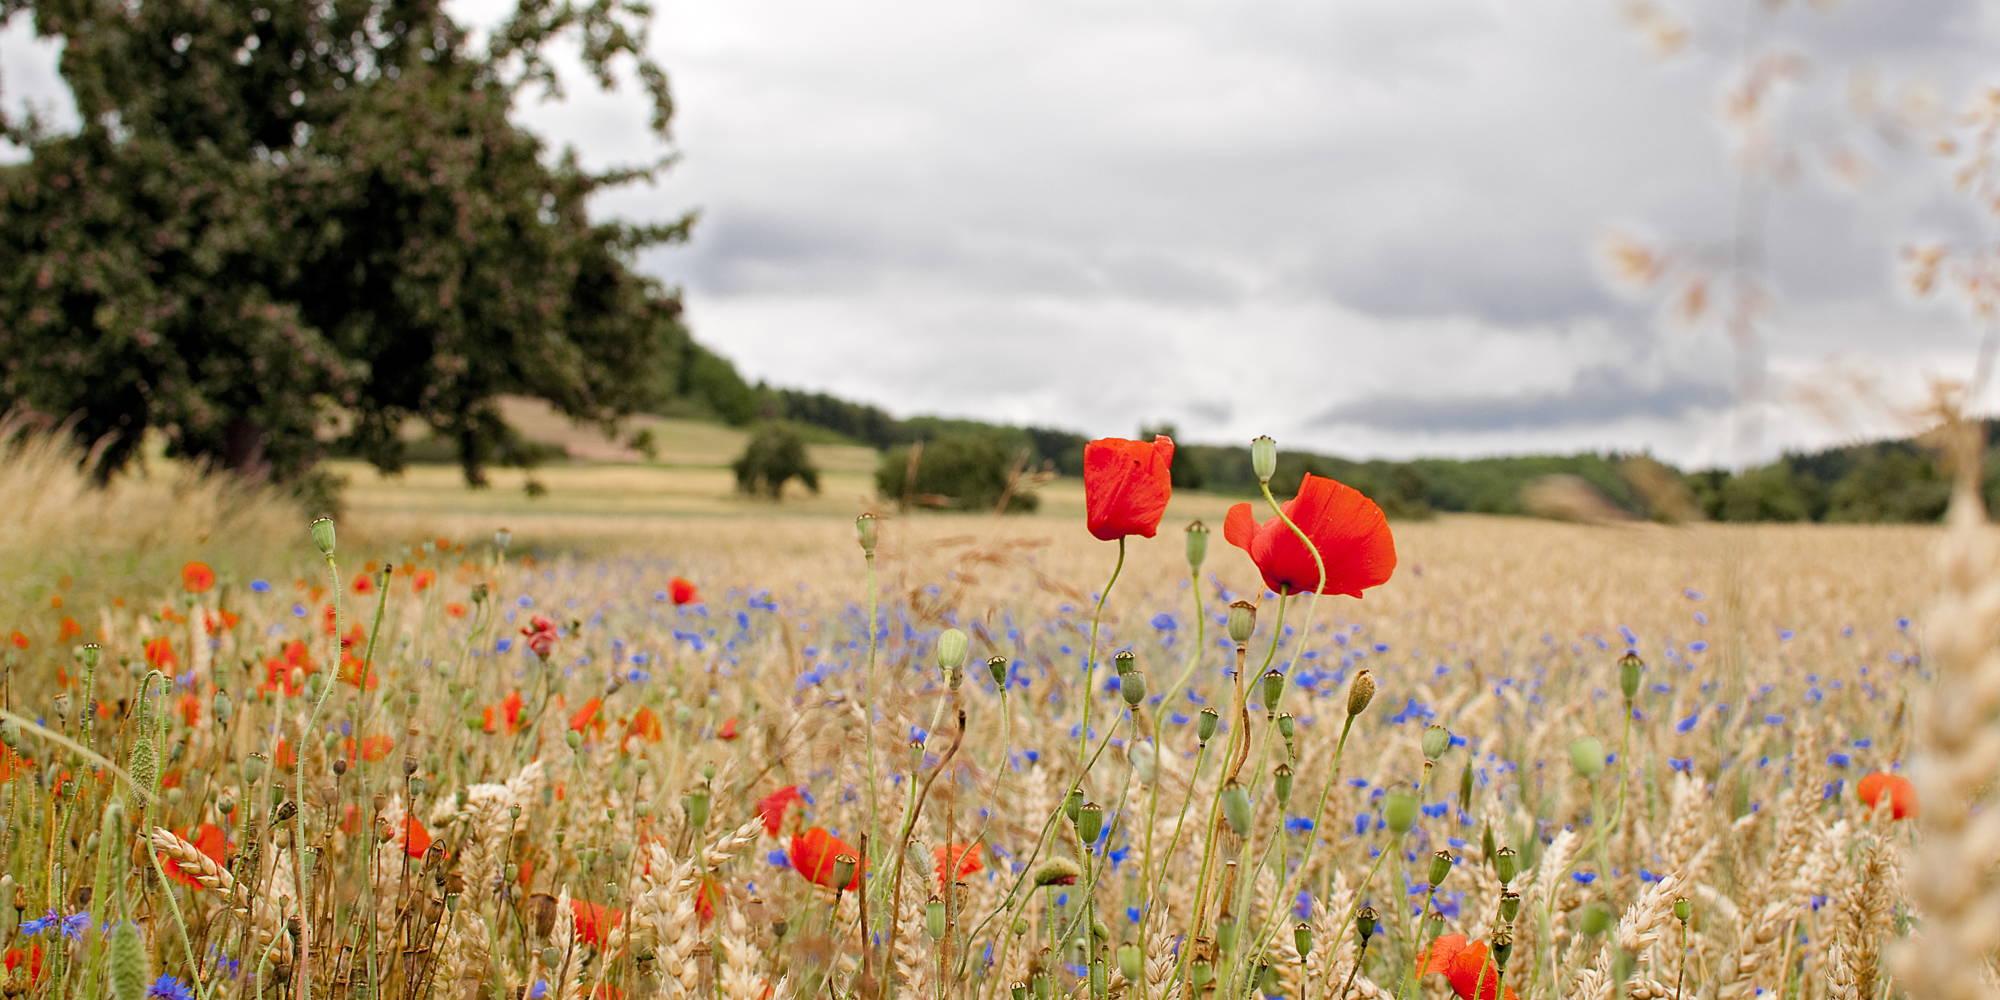 Mohnblumen in einem Feld